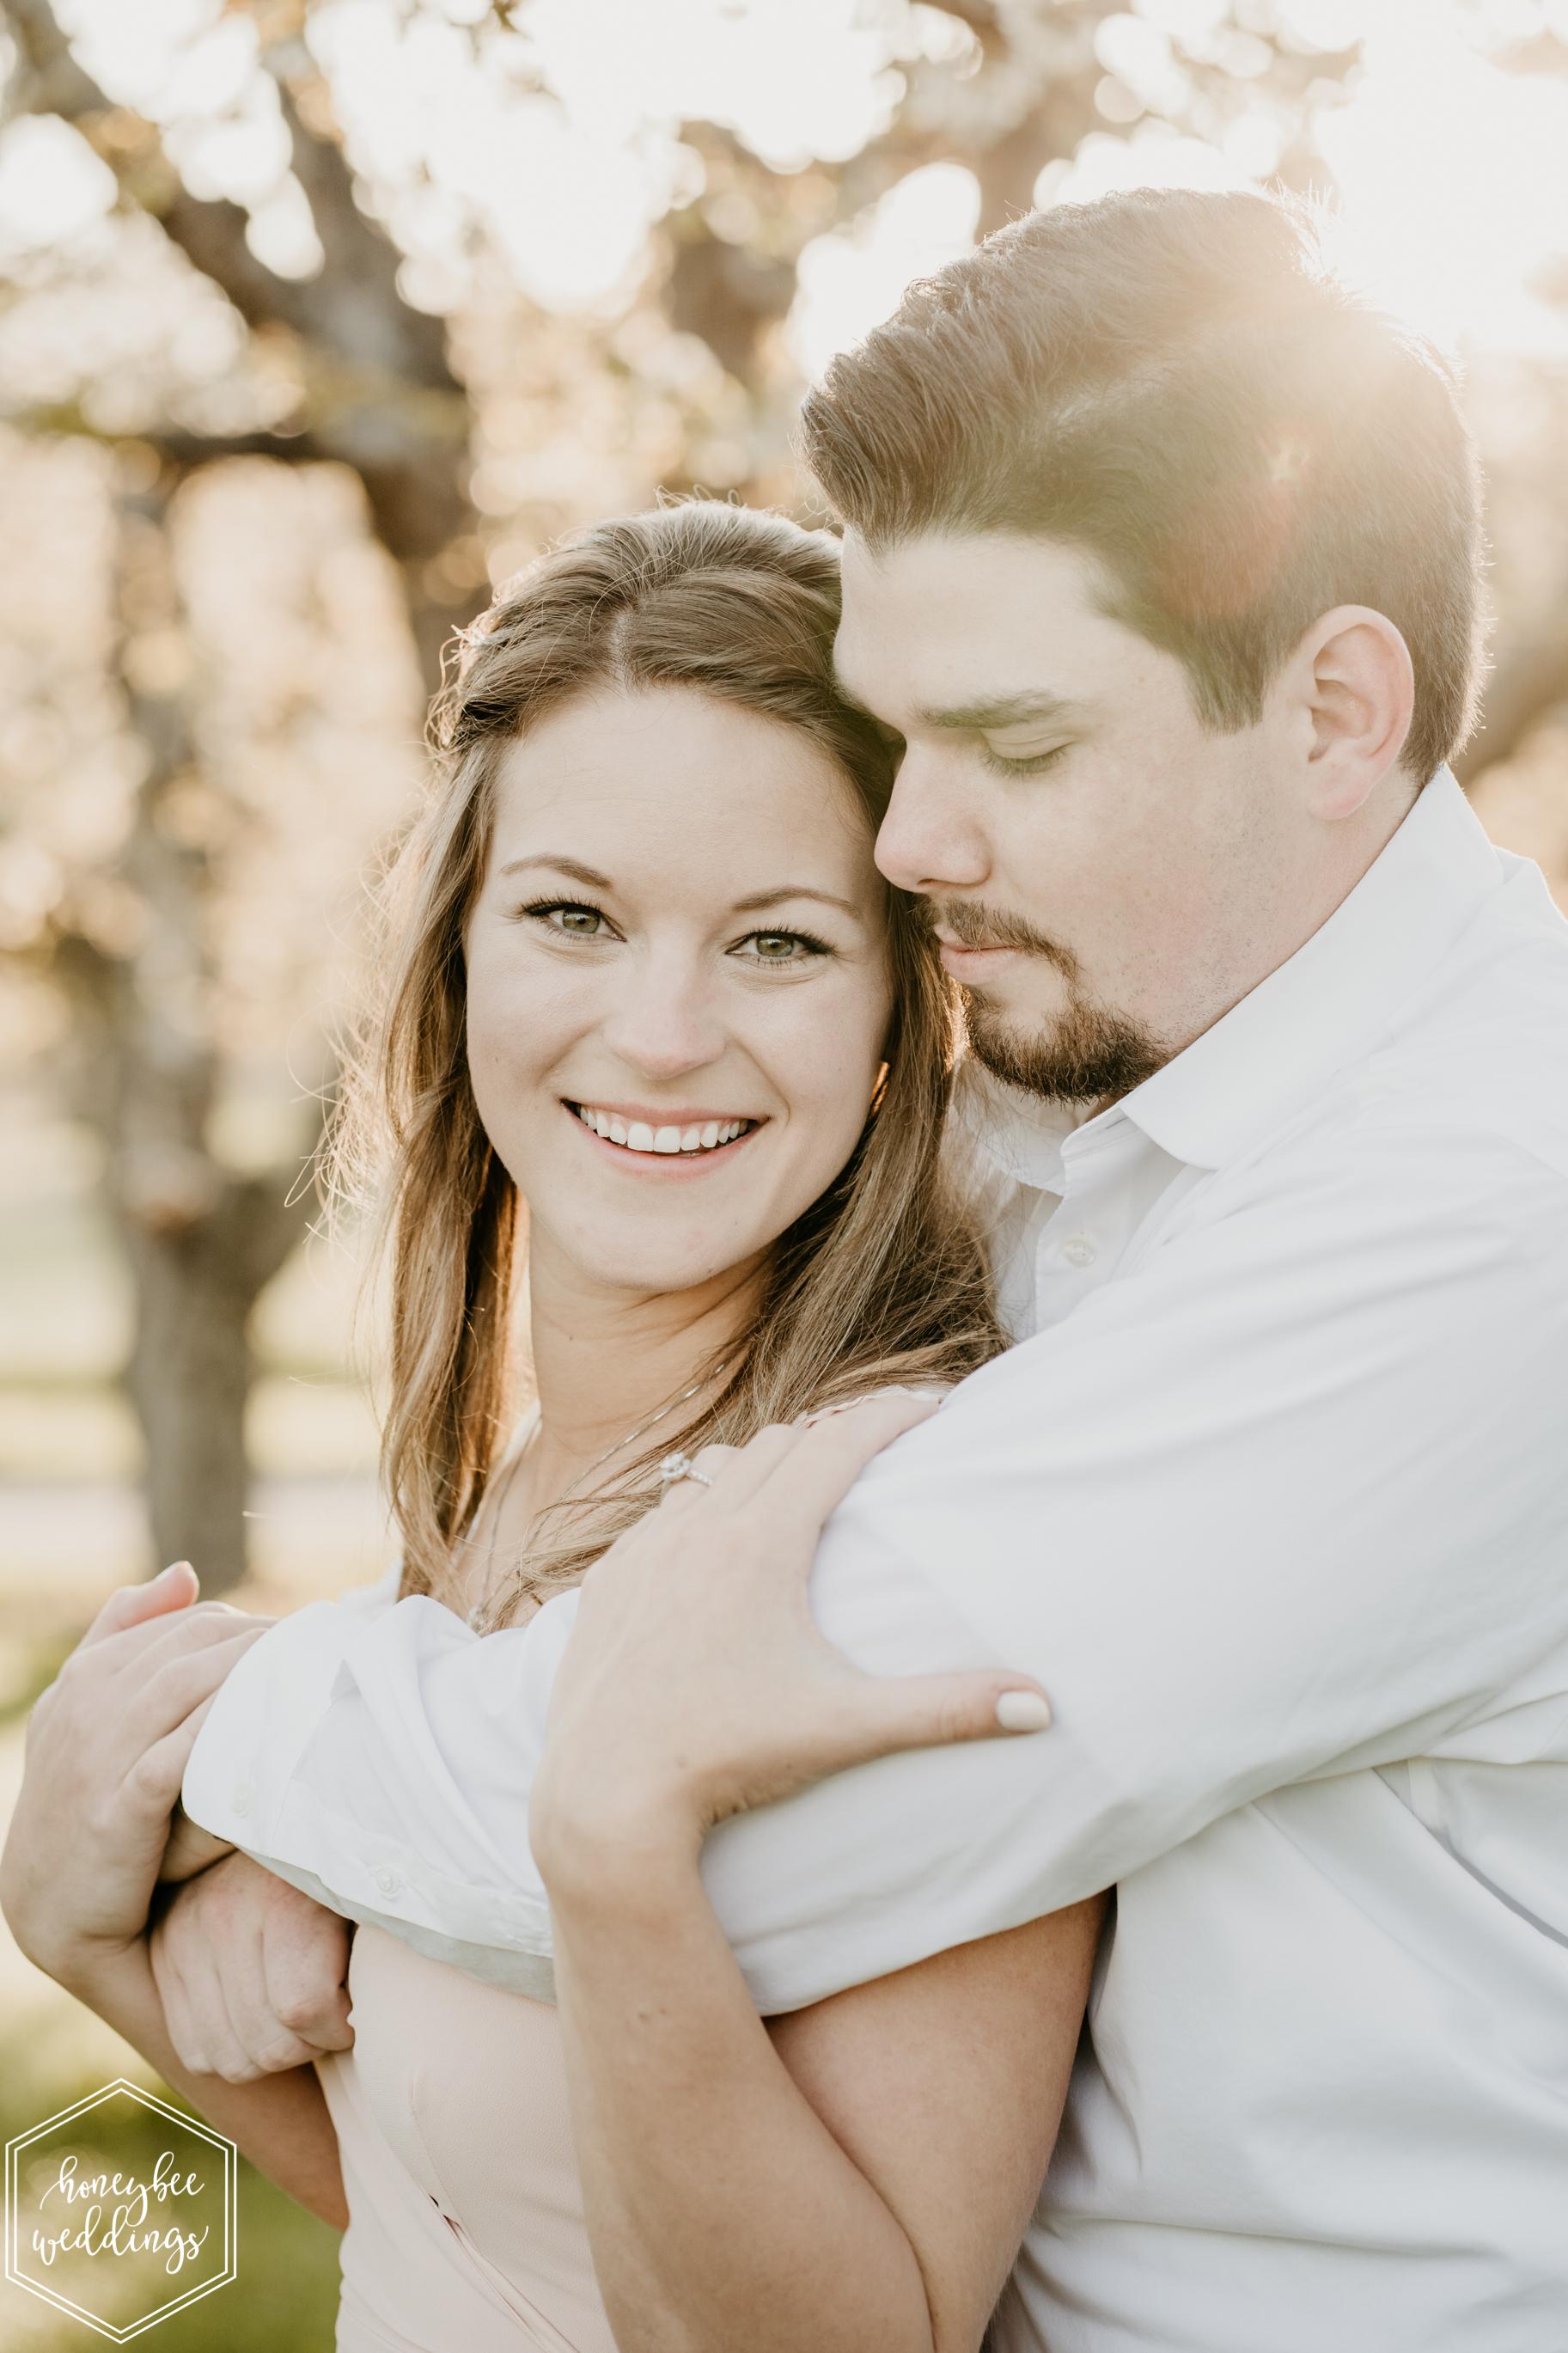 062Montana Wedding Photographer_Cherry Blossom Engagement Session_Ashlin & Luke_Honeybee Weddings_May 11, 2019-186.jpg